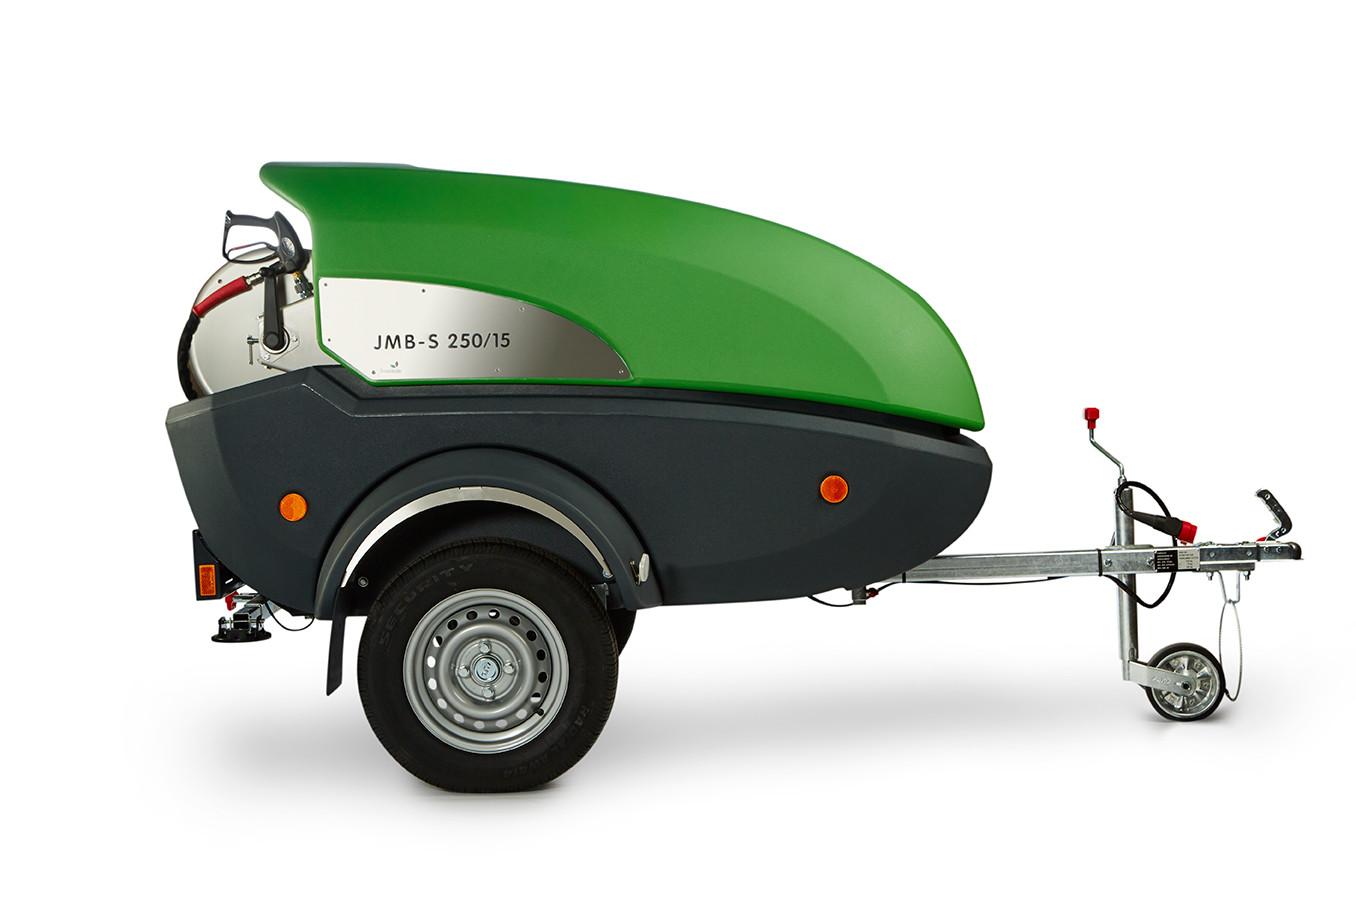 DIBO JMB-S/S+ Trailer Mounted Pressure Cleaner